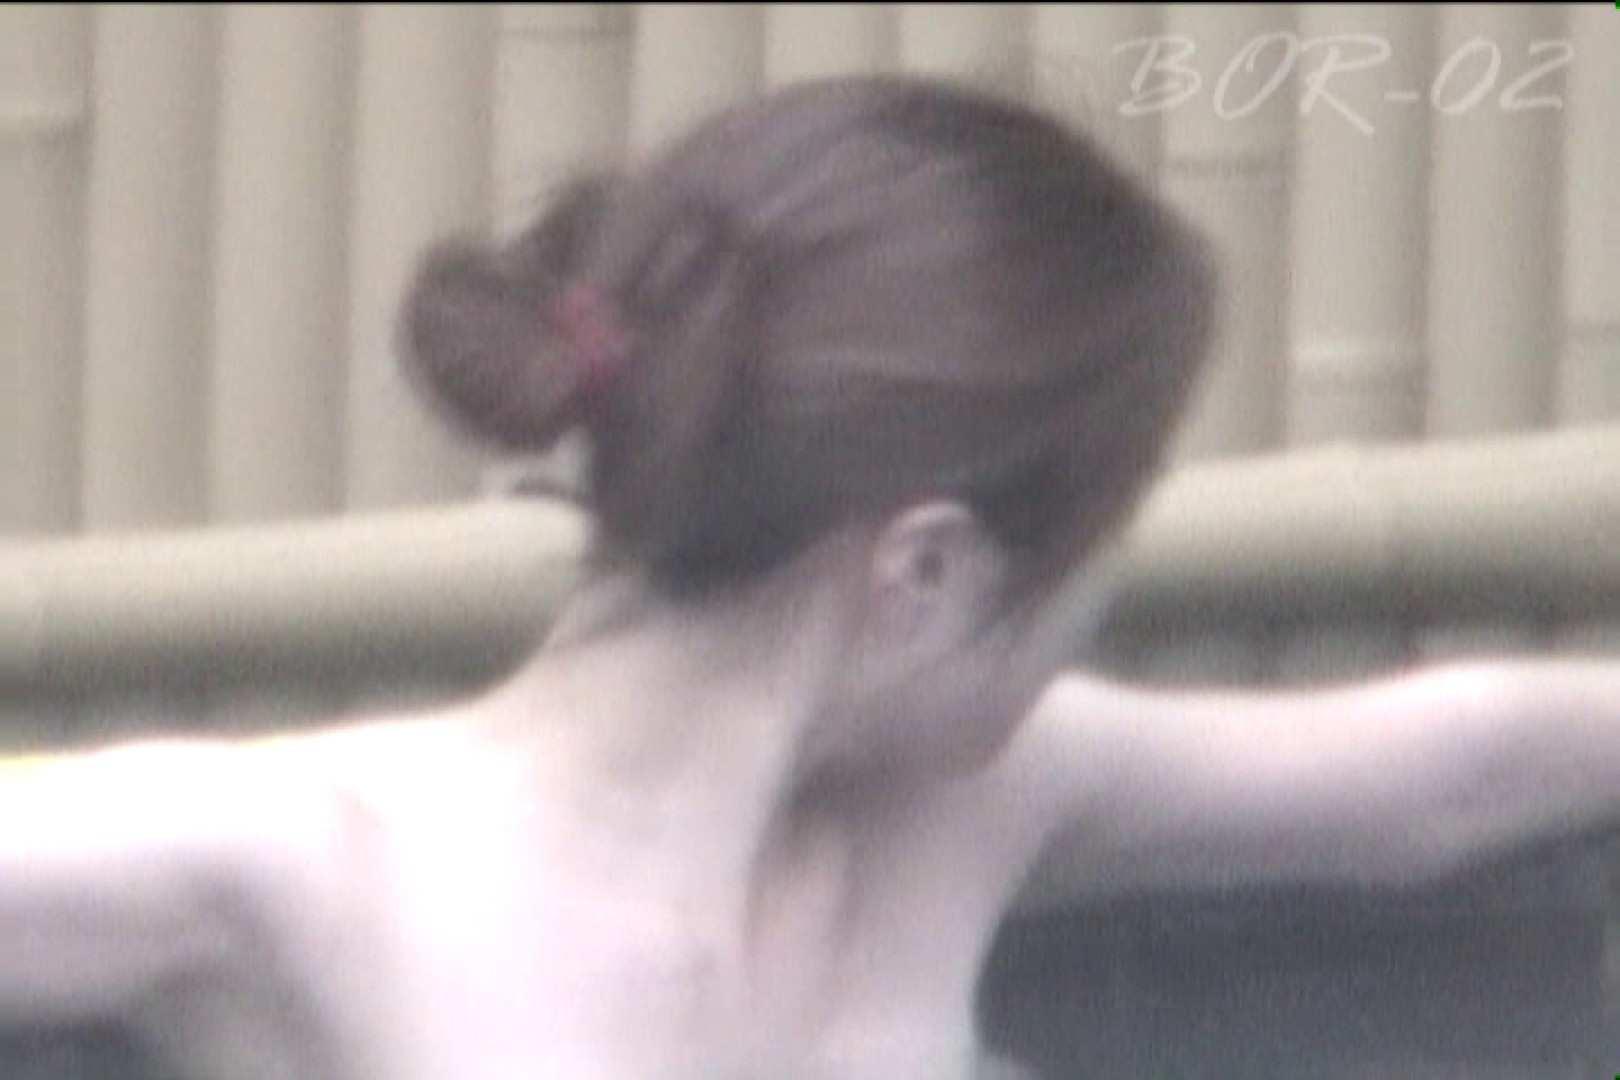 Aquaな露天風呂Vol.474 盗撮シリーズ | 露天風呂編  111PIX 109